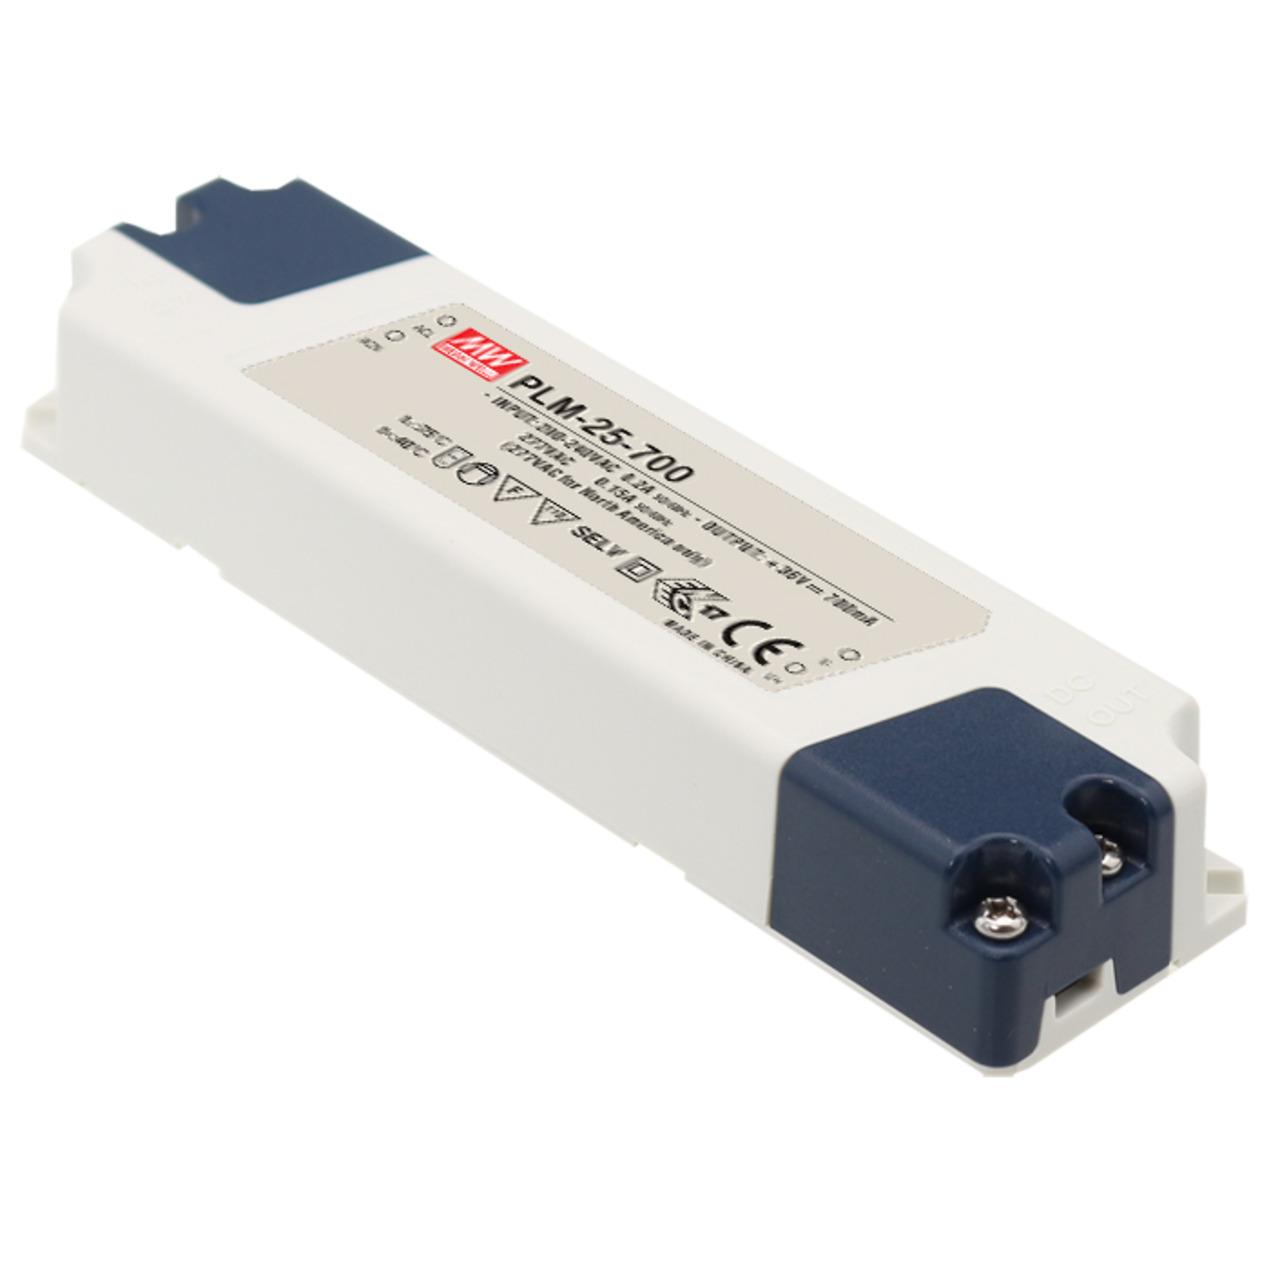 Mean Well Konstantstrom-Netzteil PLM-25-700- 25 W- 700 mA- 30 - 50 V- dimmbar- IP30